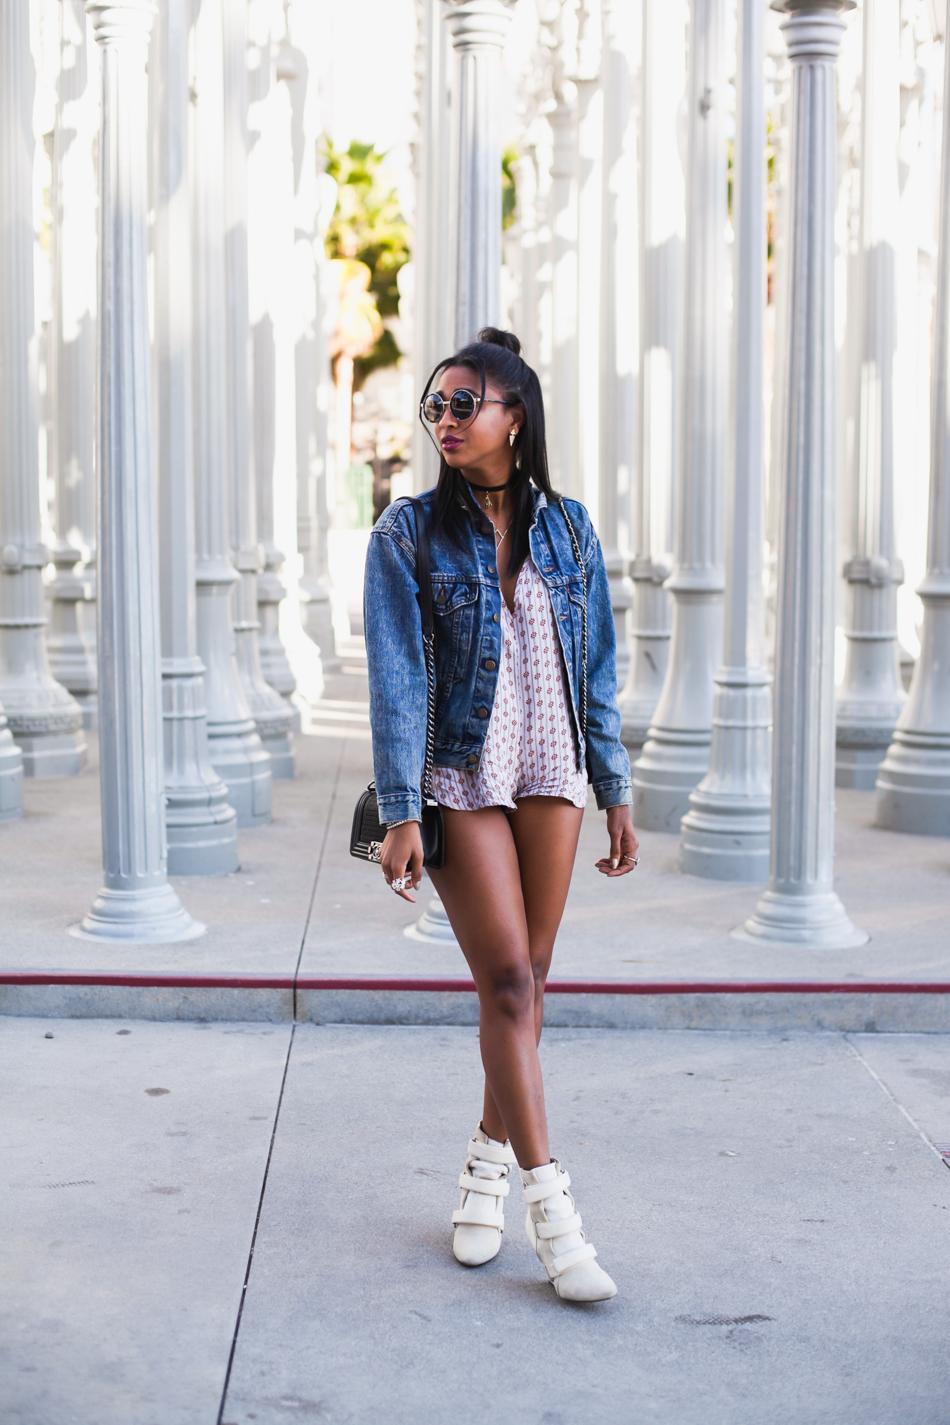 lacma-los-angeles-miami-fashion-blogger